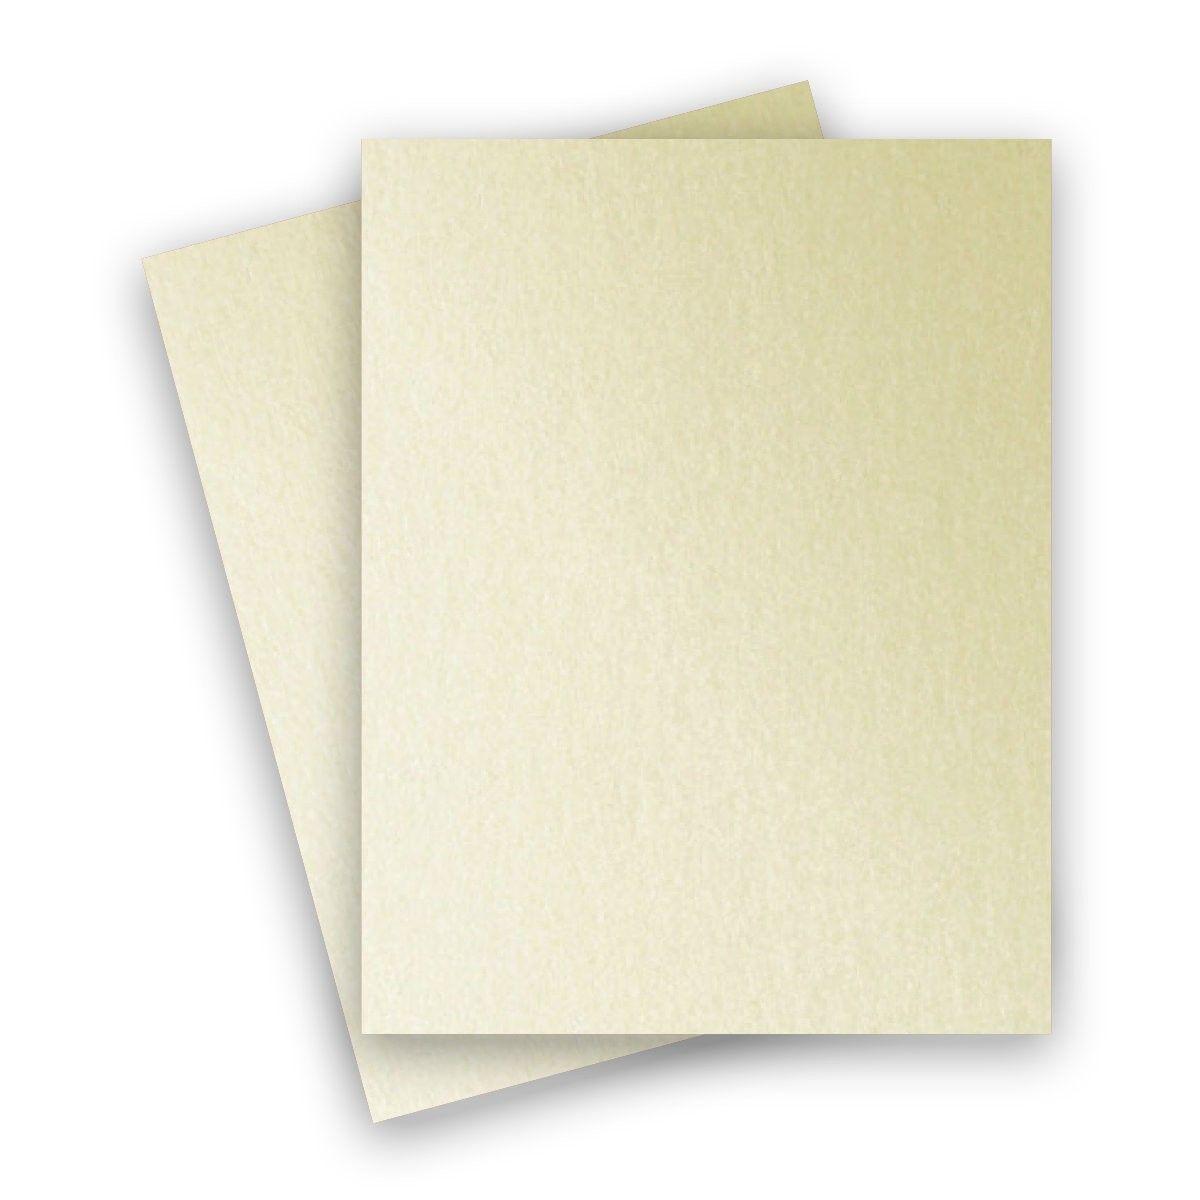 b4fbf573a115 Stardream Metallic - 8.5X11 Paper - OPAL - 81lb Text (120gsm) - 25 PK